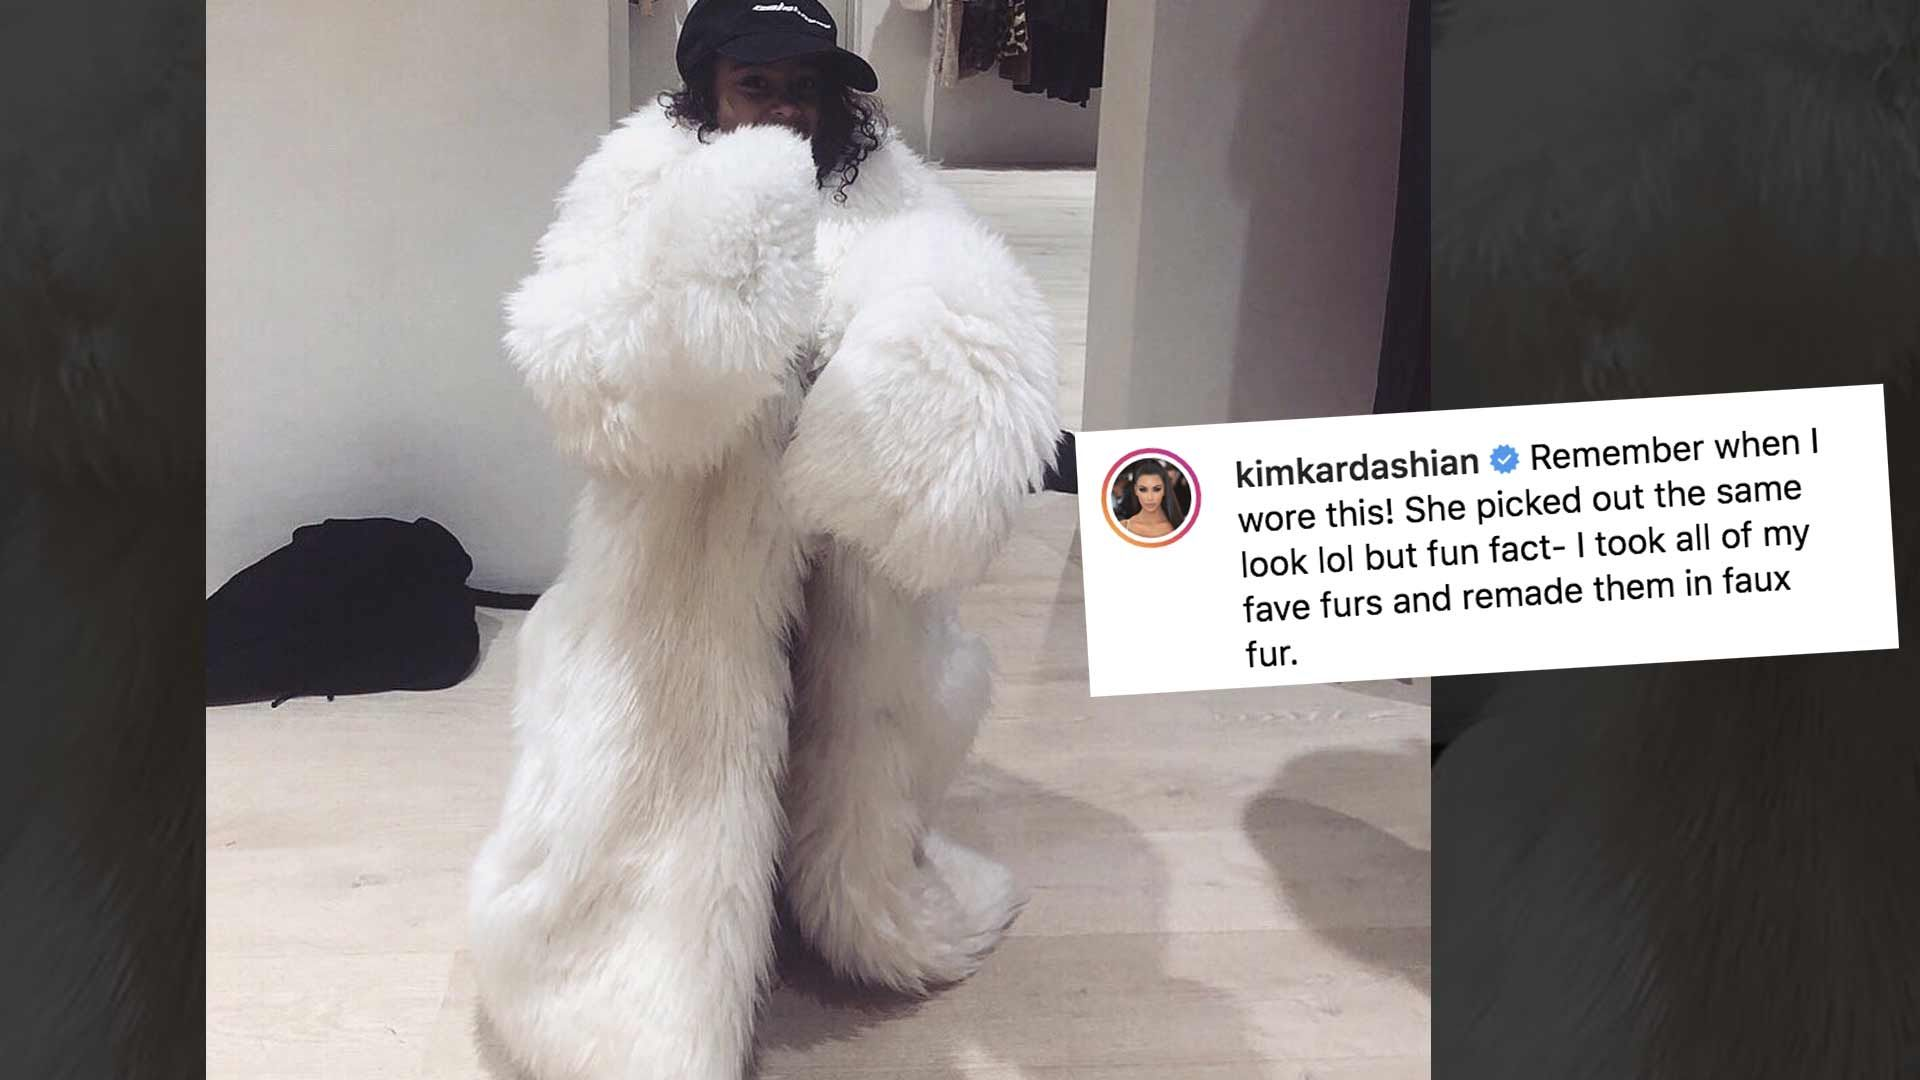 Kim Kardashian Shares North West in 'Fur,' Shuts Down Haters